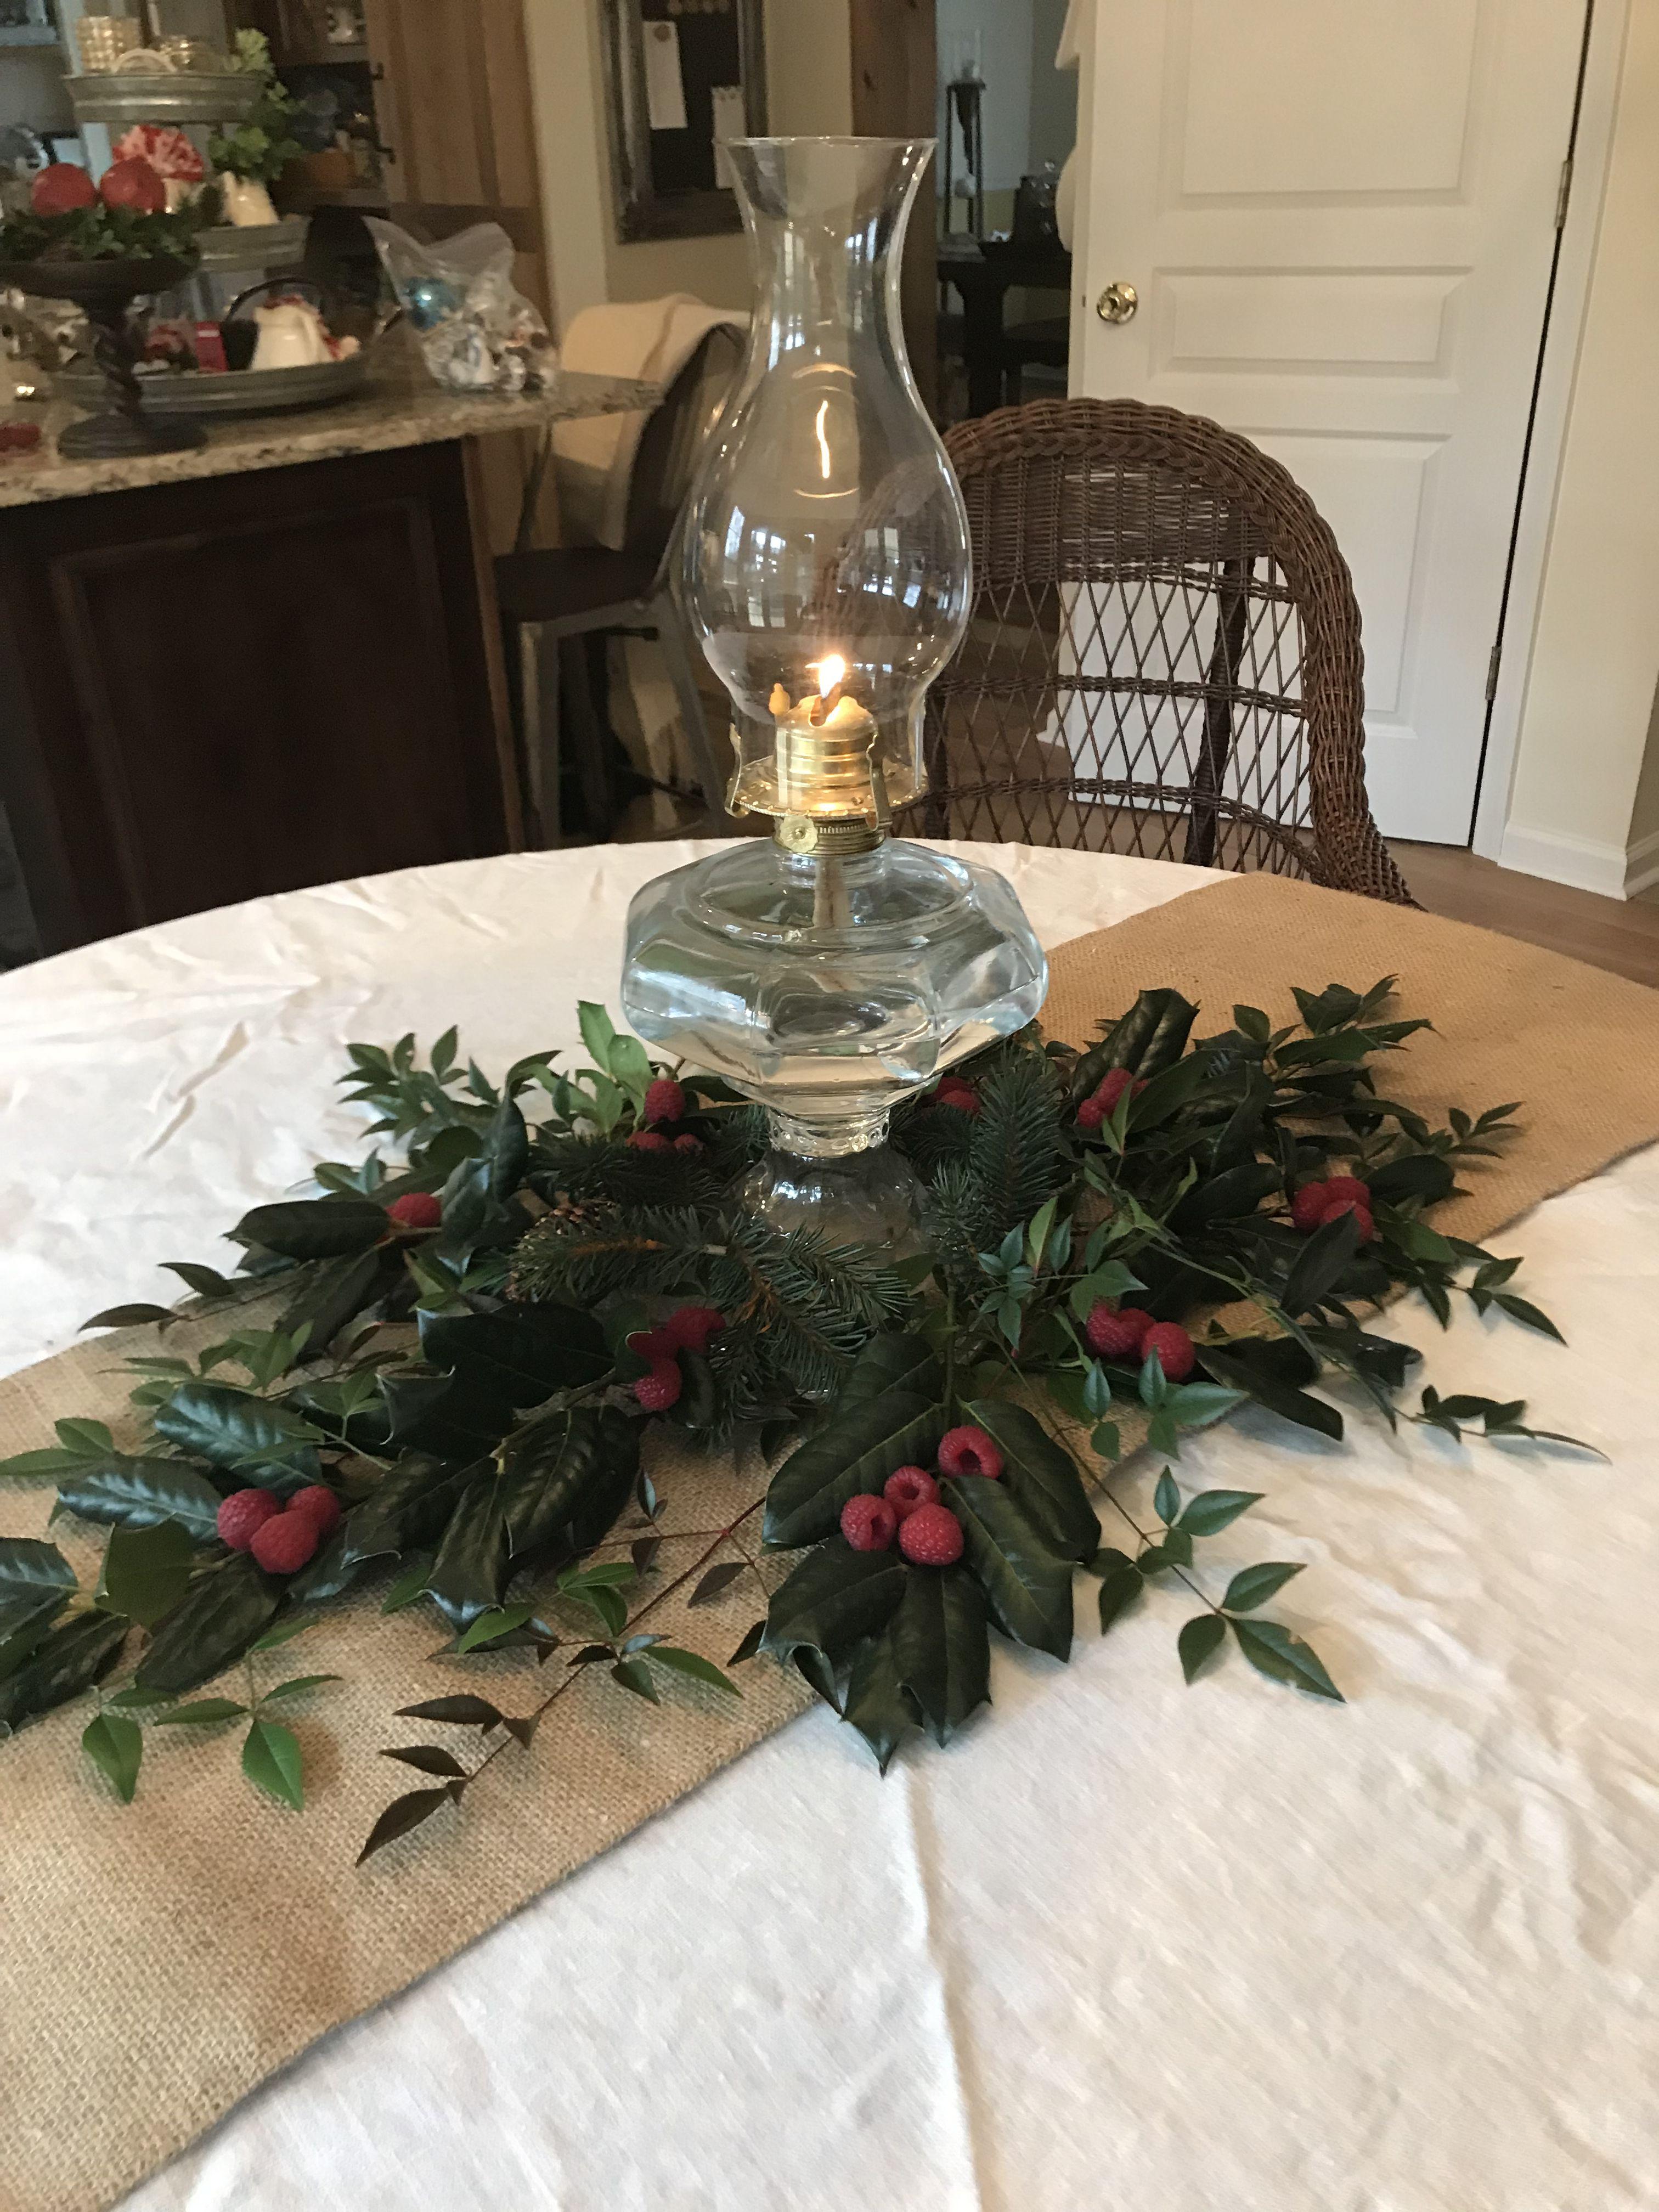 Gas Lamp Fresh Greenery Christmas Centerpieces Christmas Table Decorations Christmas Decorations